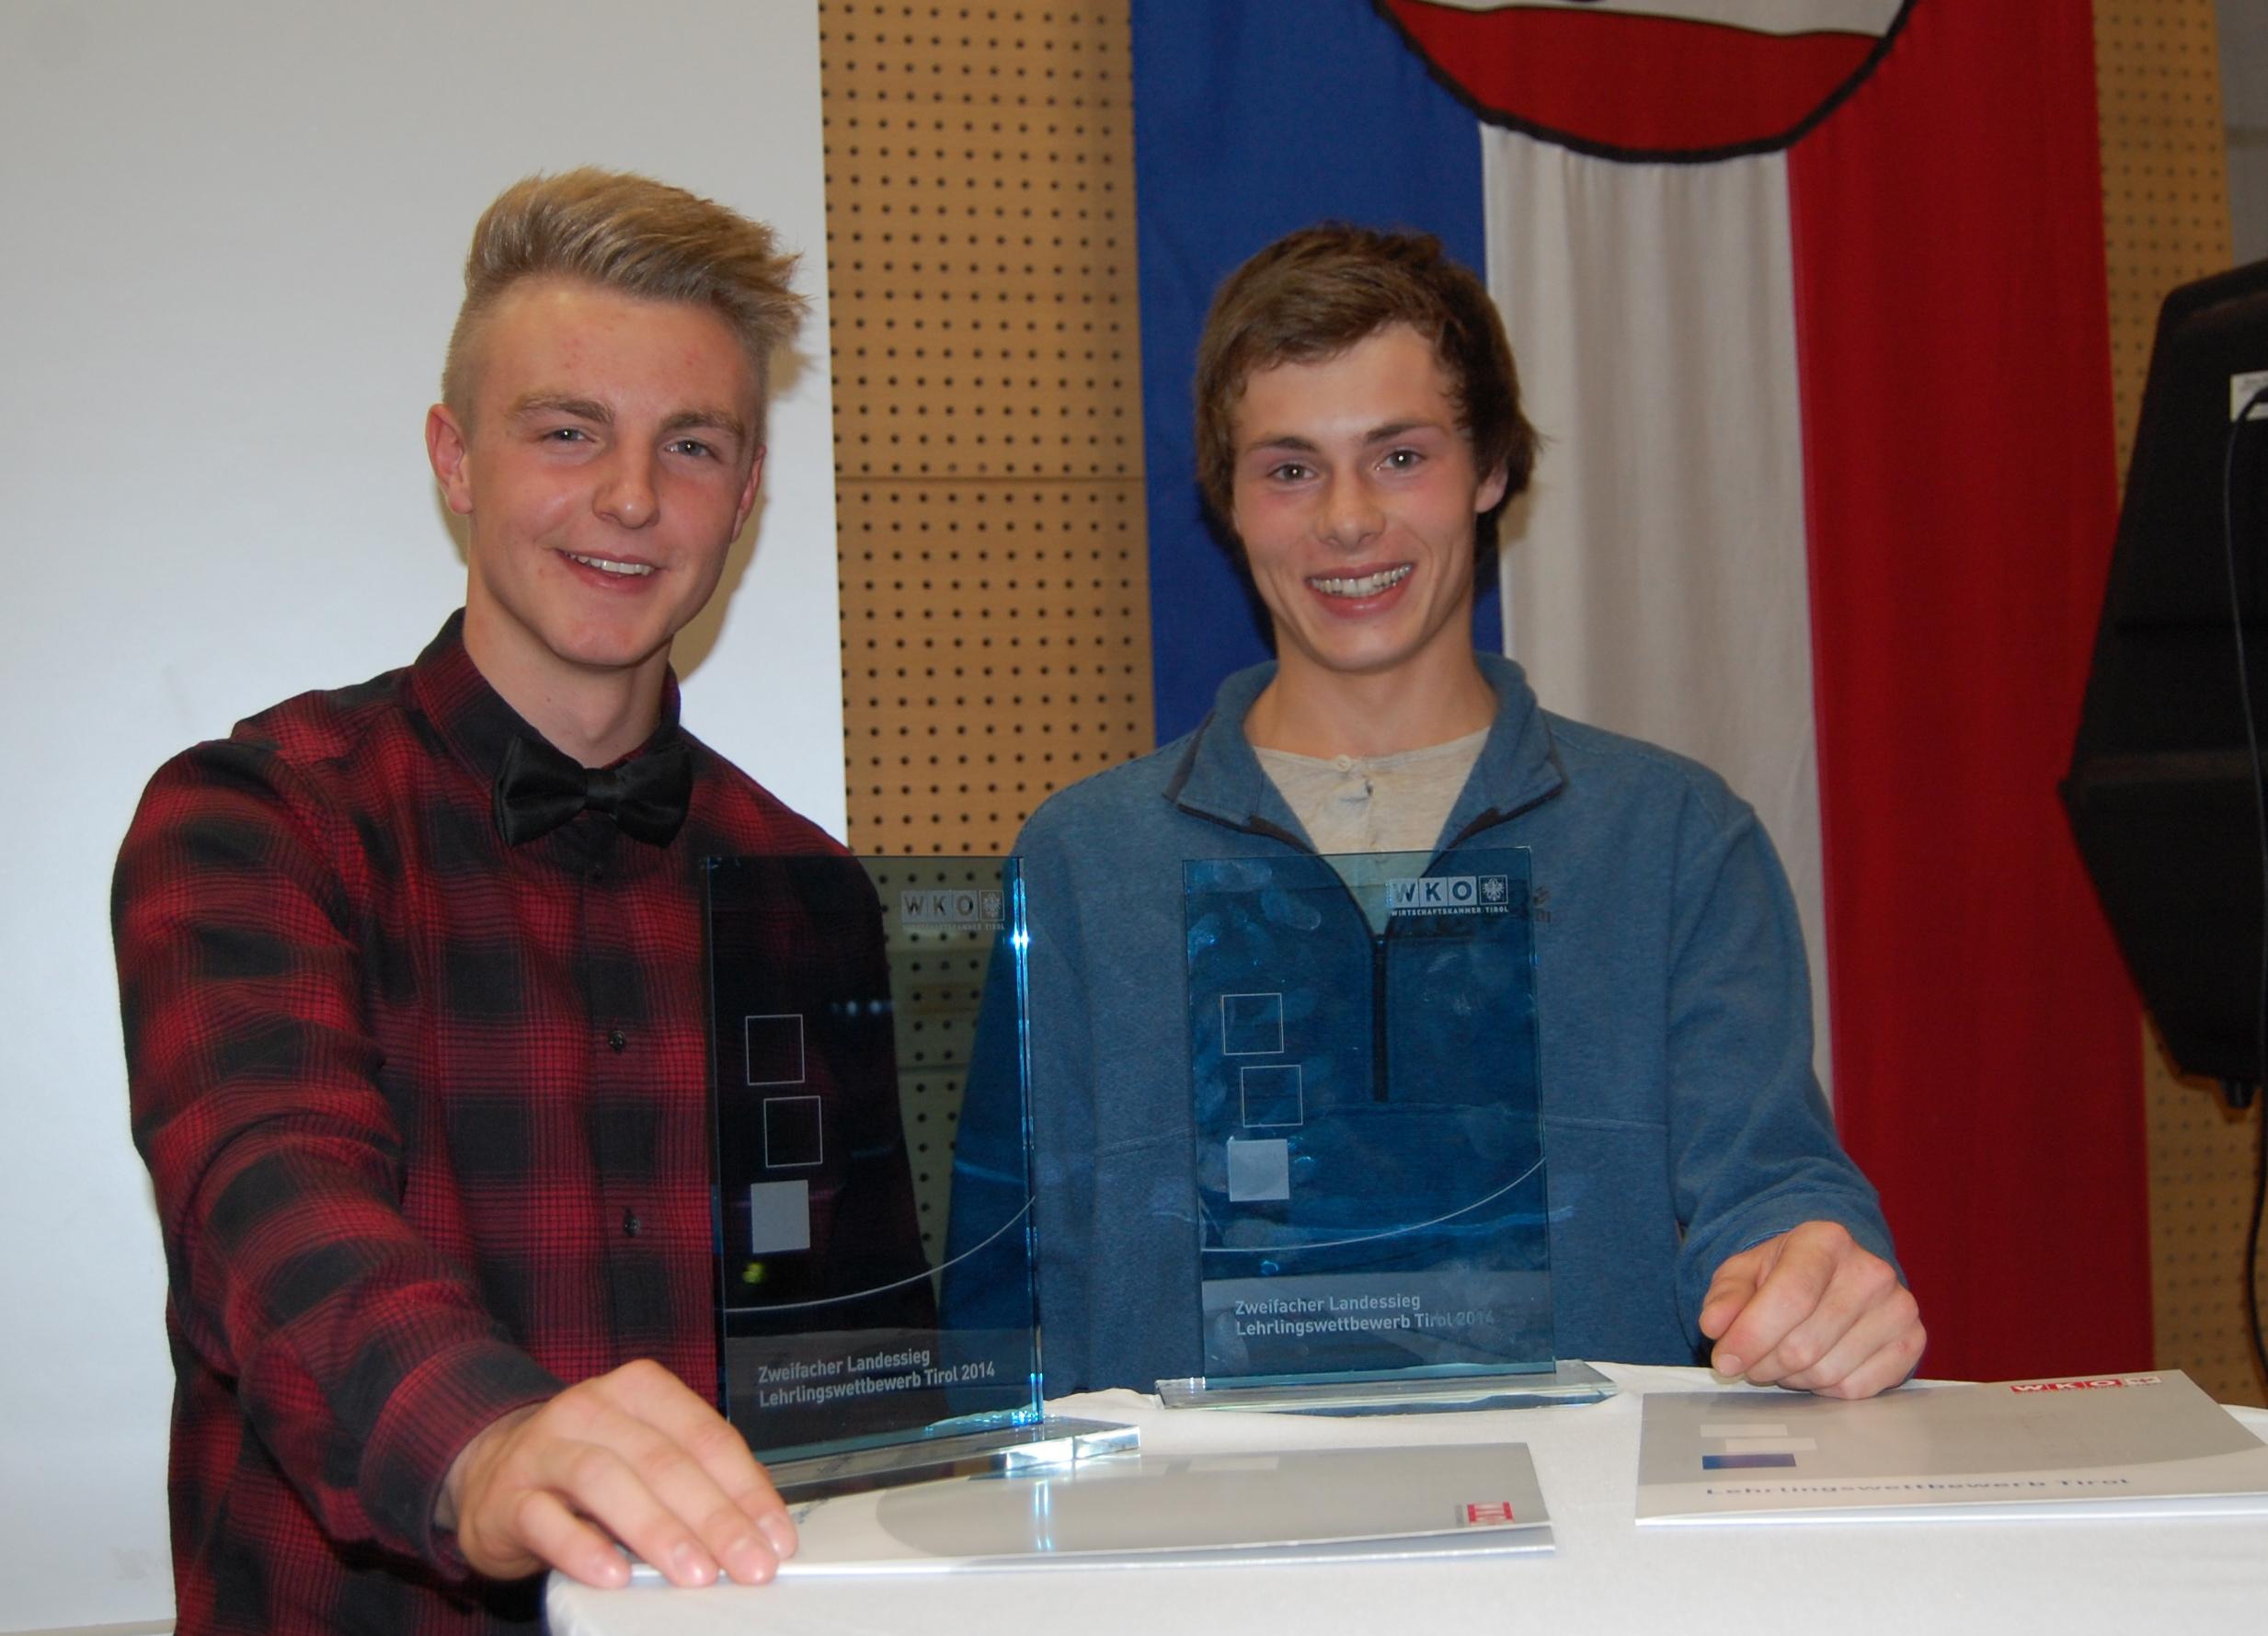 2fache Landessieger v.l.n.r.: Michael Assmair und Julian Gruber